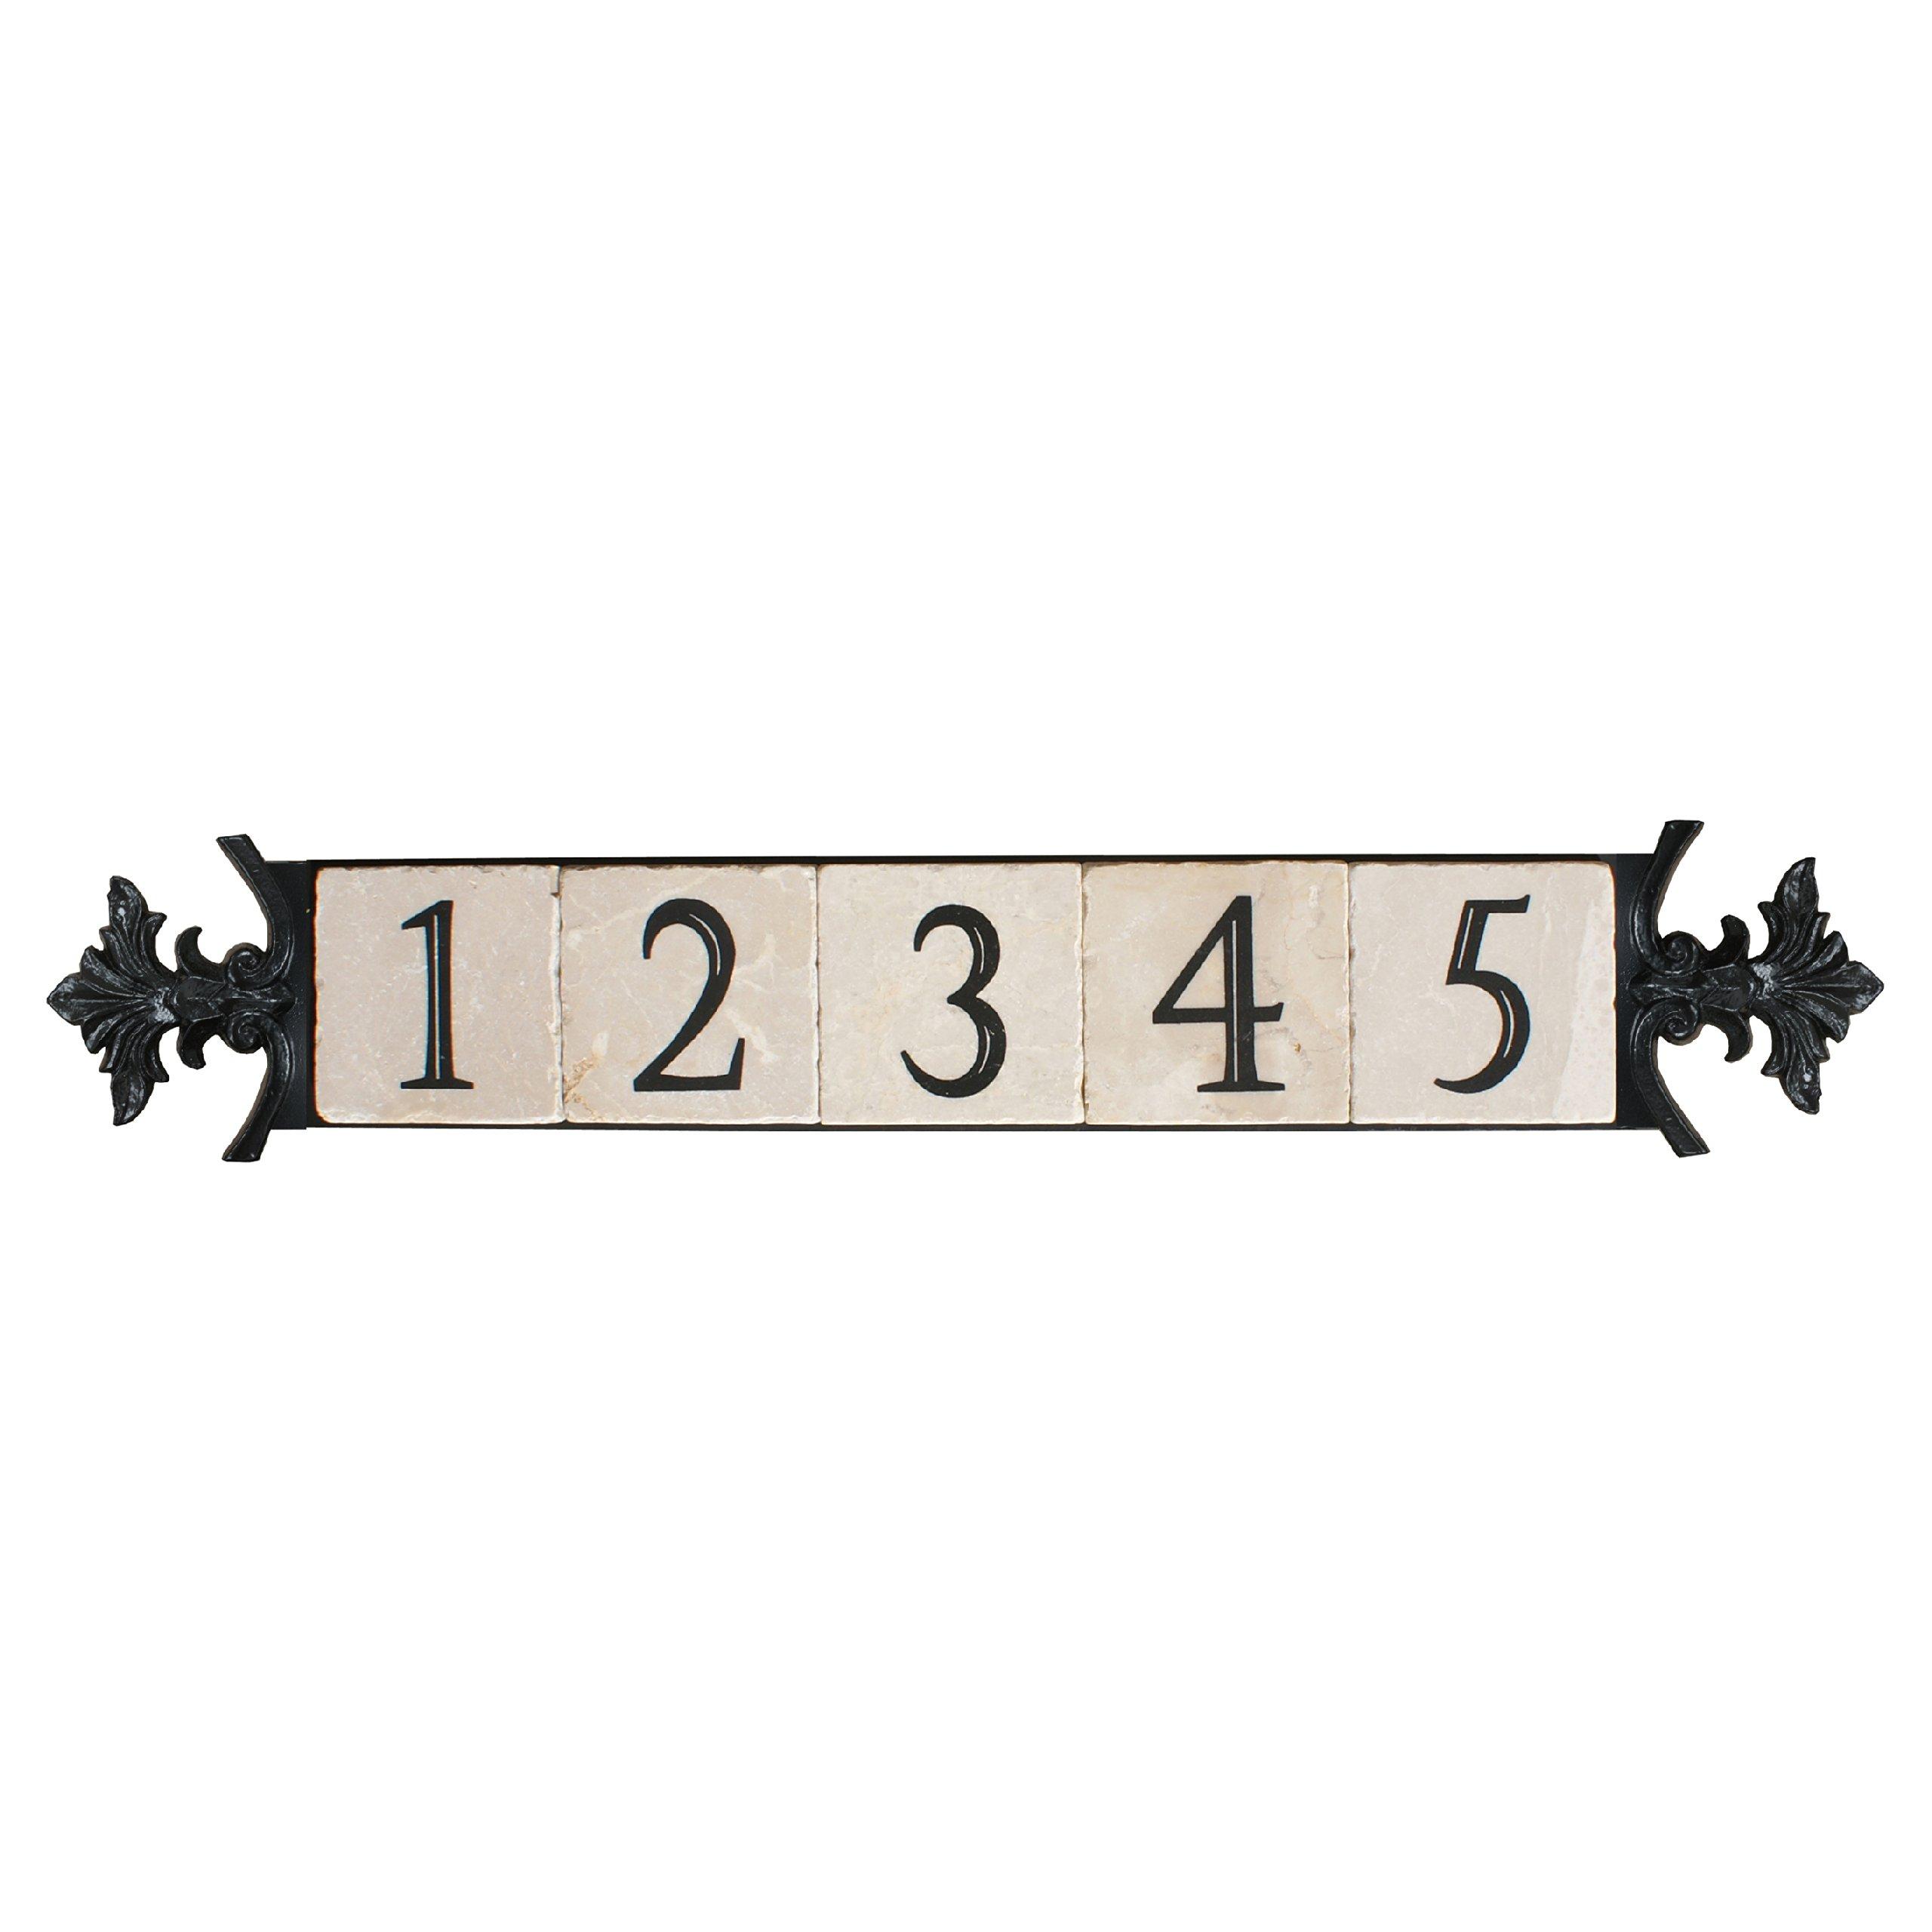 NACH KA House Address Sign/Plaque - Small Crest, 5 Numbers, Iron, 28 x 5 x 1''